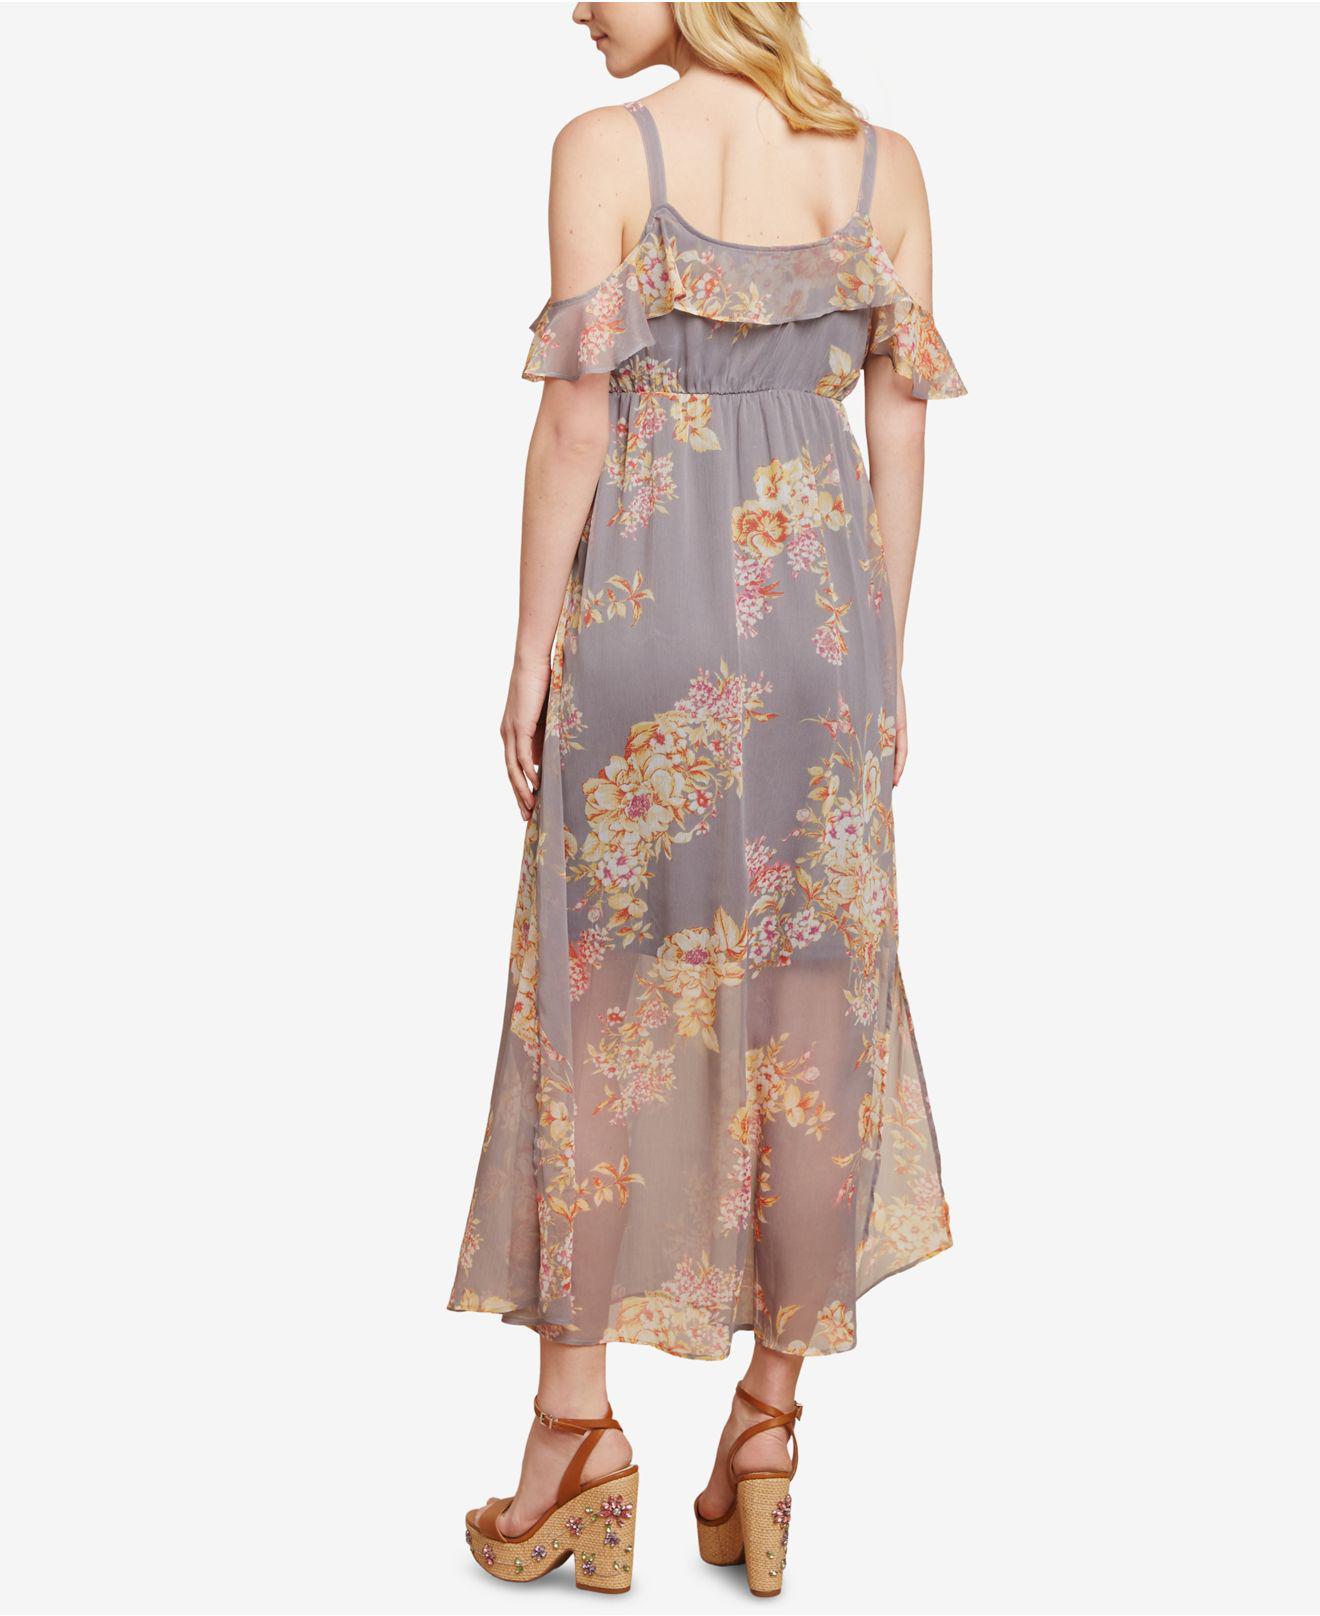 723d941f0b741 Jessica Simpson Sleeveless Ruffled Maternity Maxi Dress in Gray - Lyst